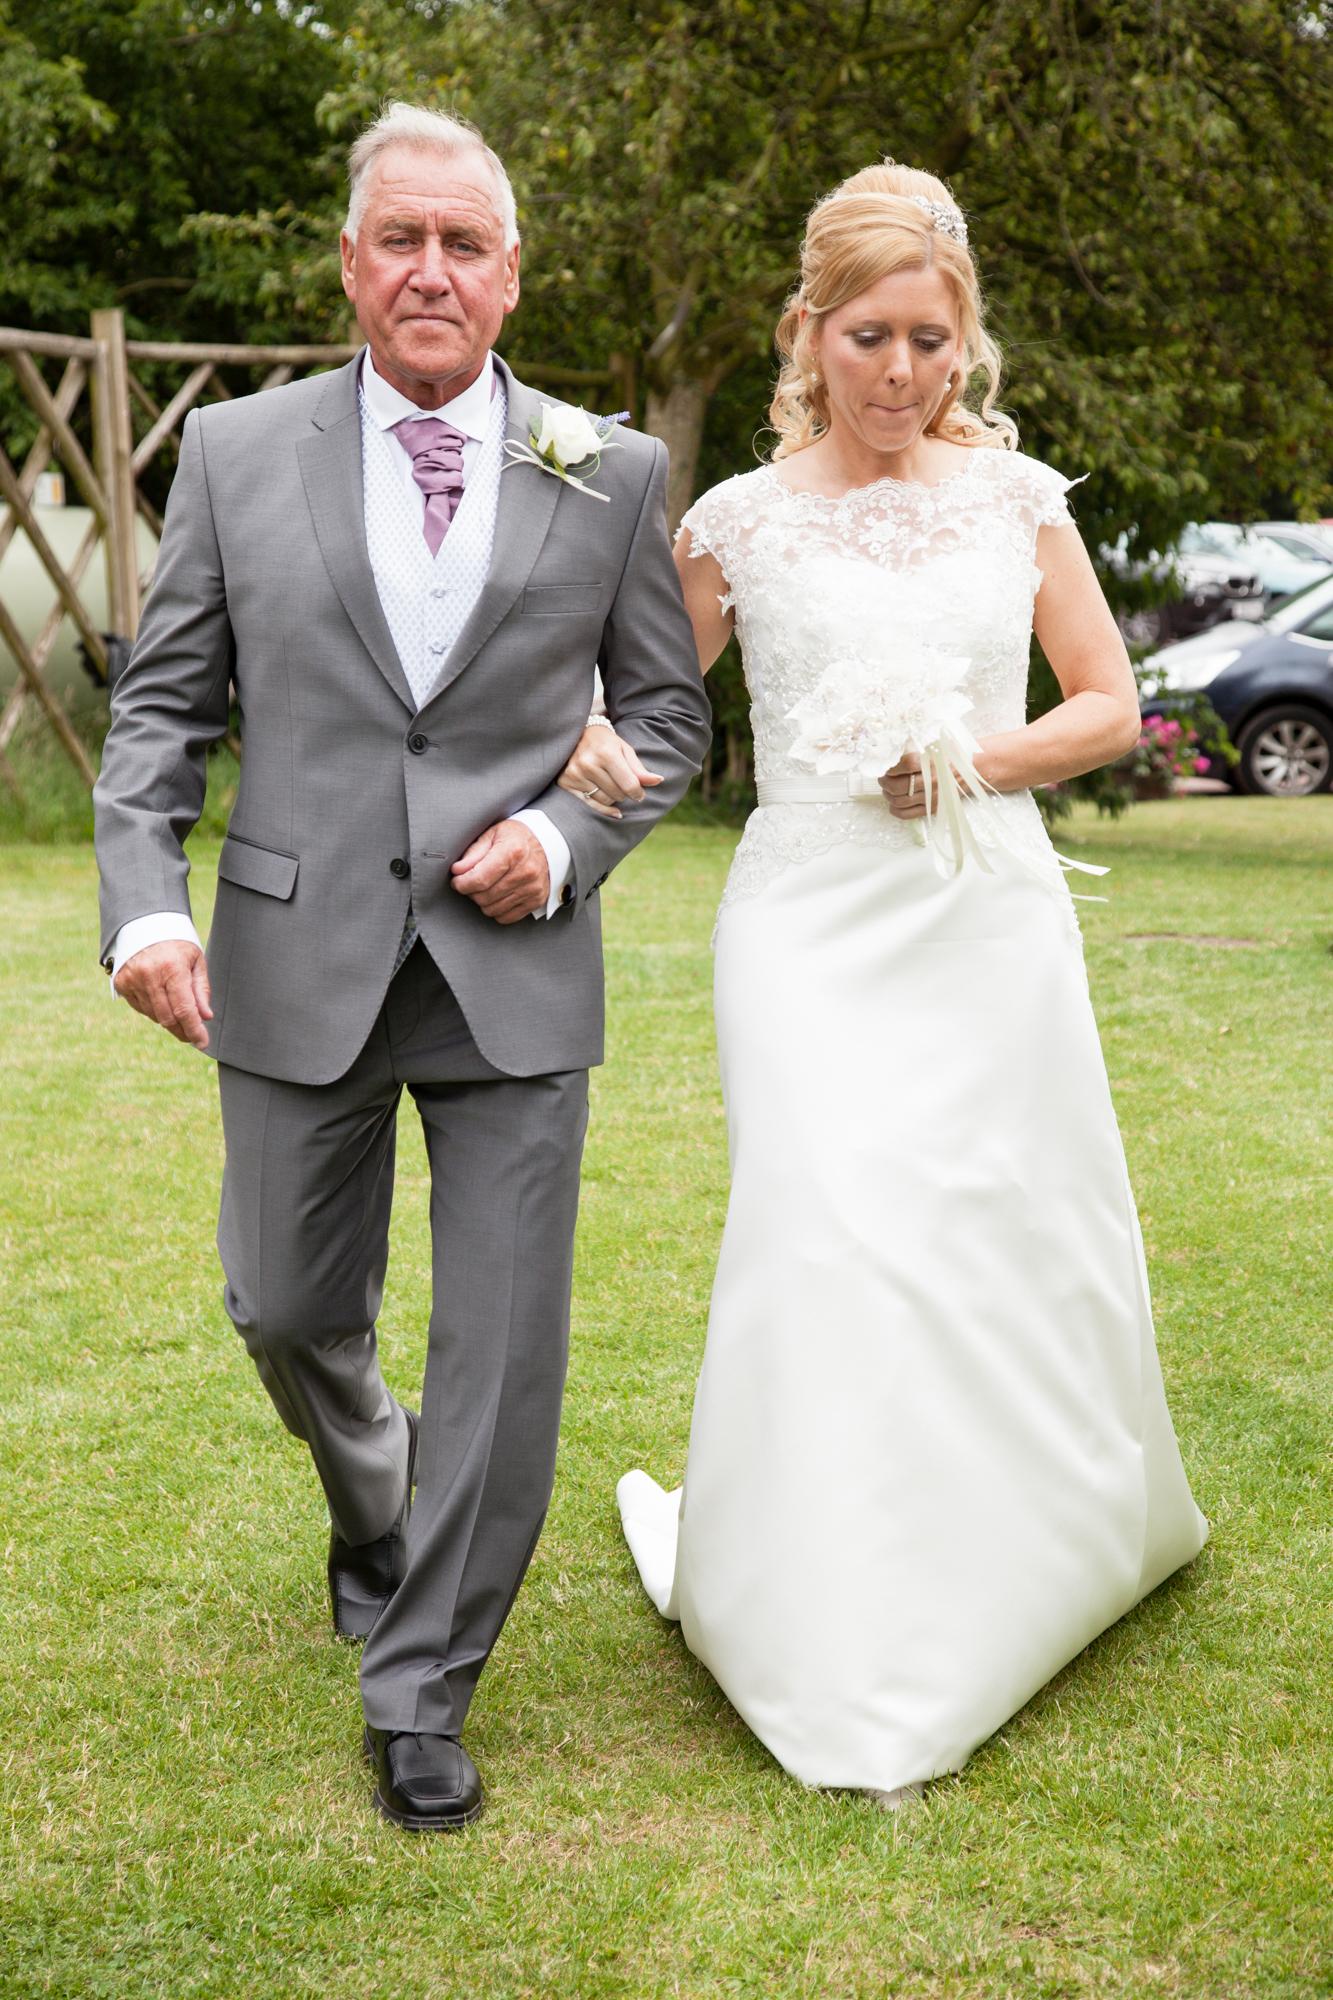 110715_LisaCraigJohnson_Wedding_5597189_WebWM.jpg